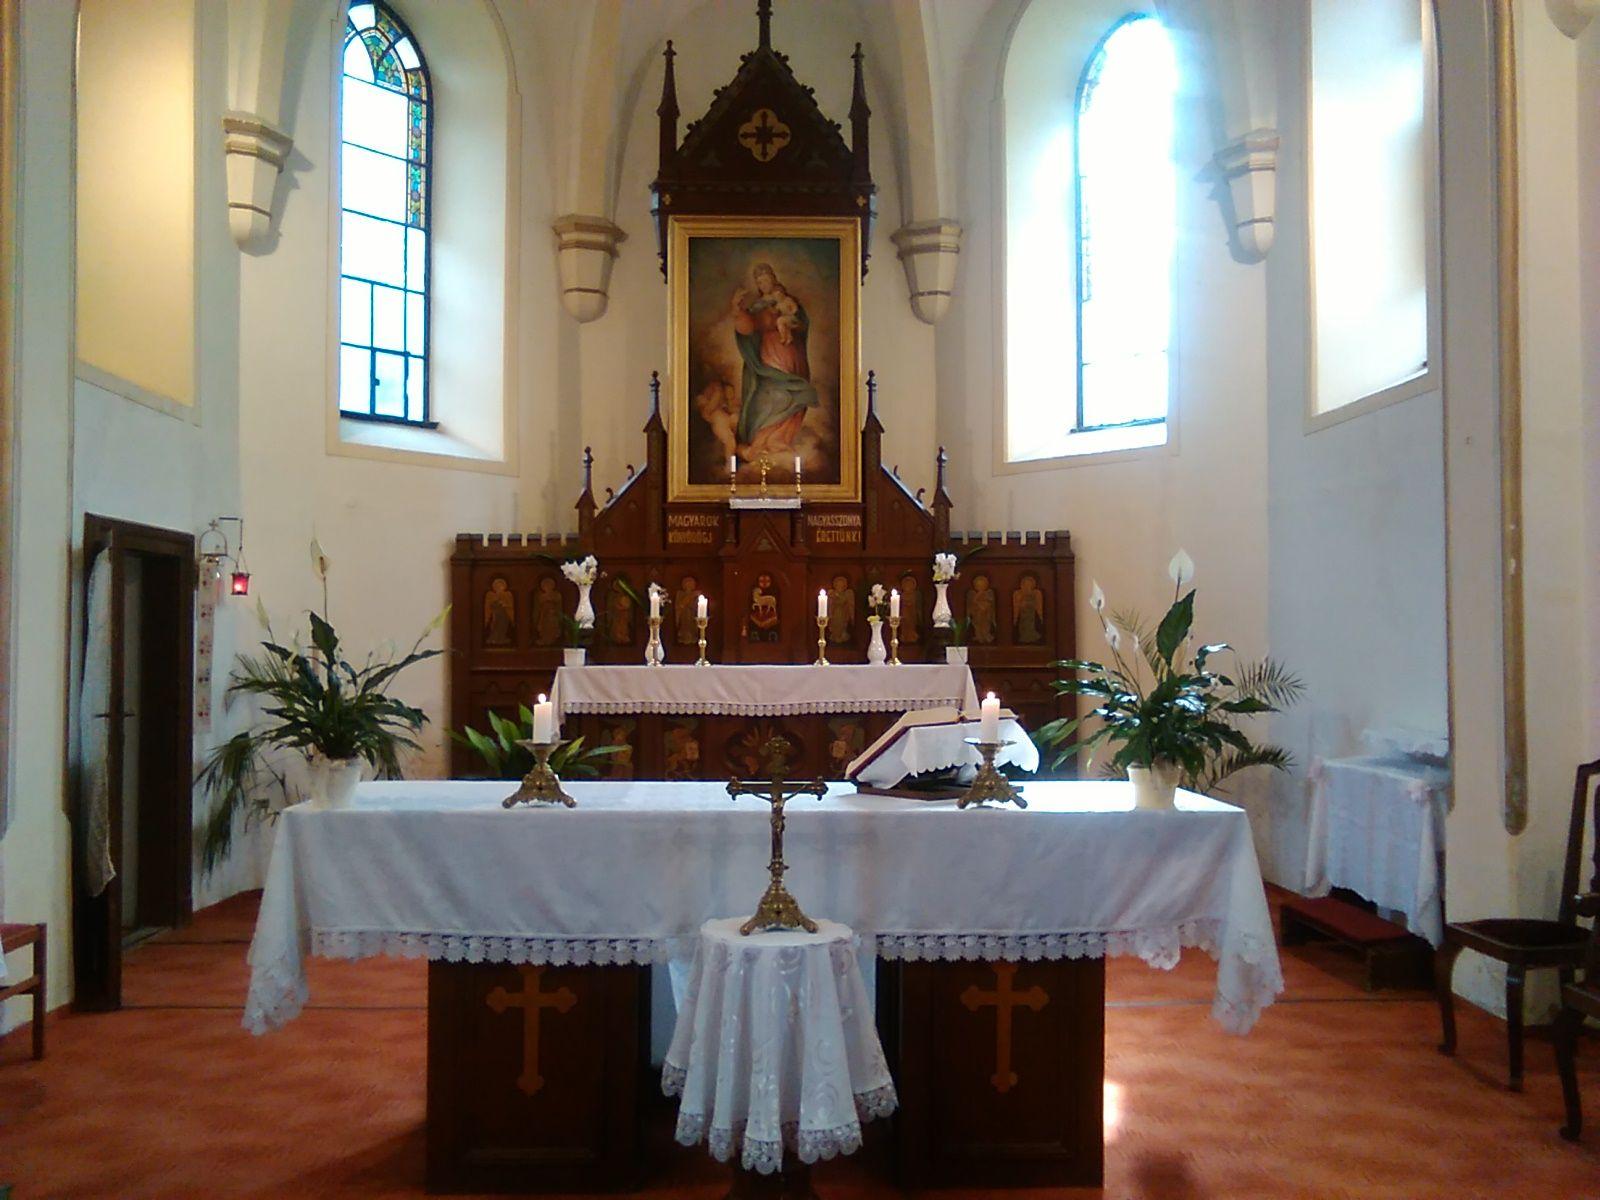 Leps Ny Magyarok Nagyasszonya R Mai Katolikus Templom Fot  # Muebles Bizkaia Guenes